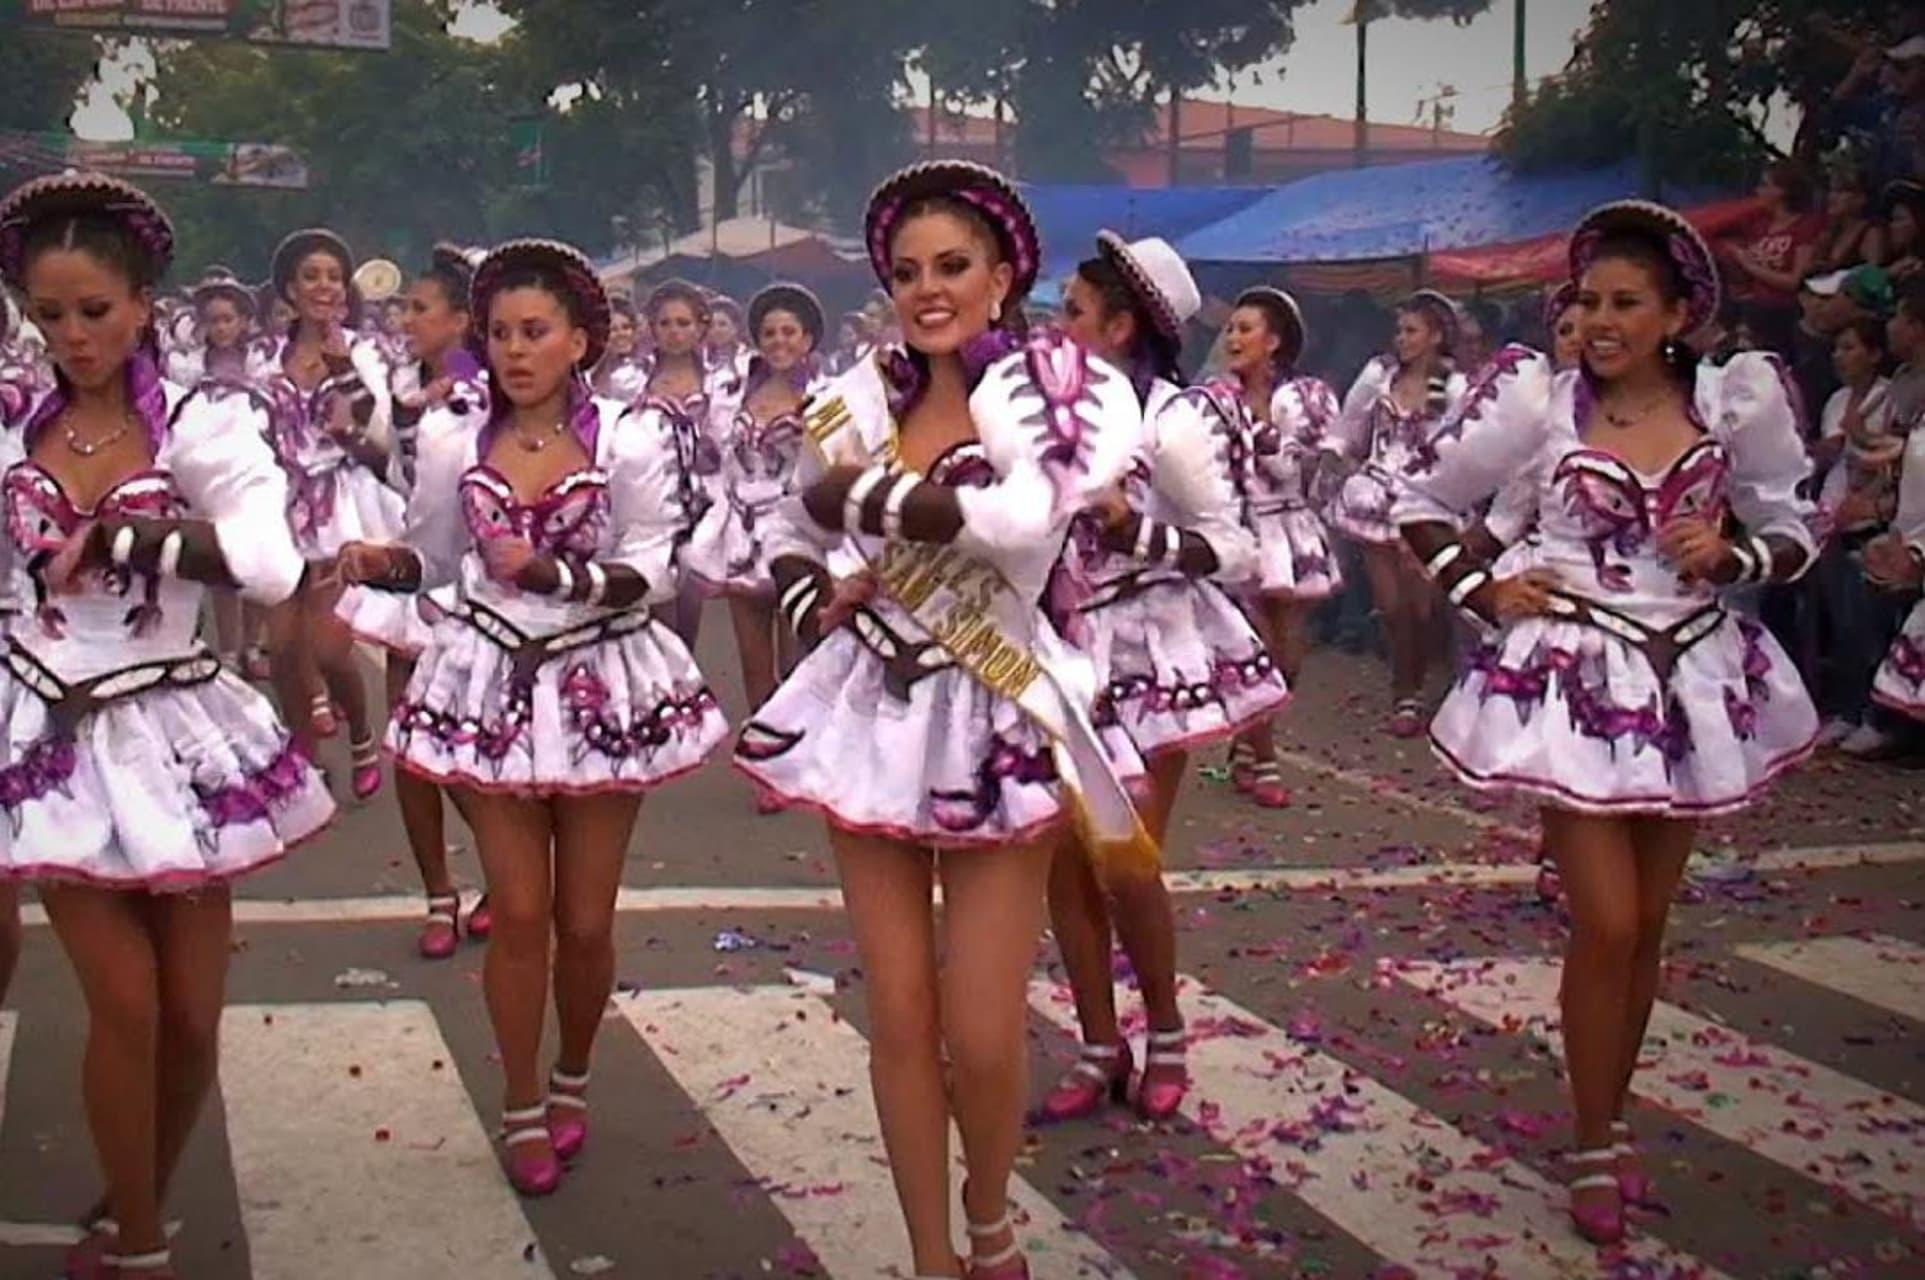 La Paz - Bolivian Folk Festival